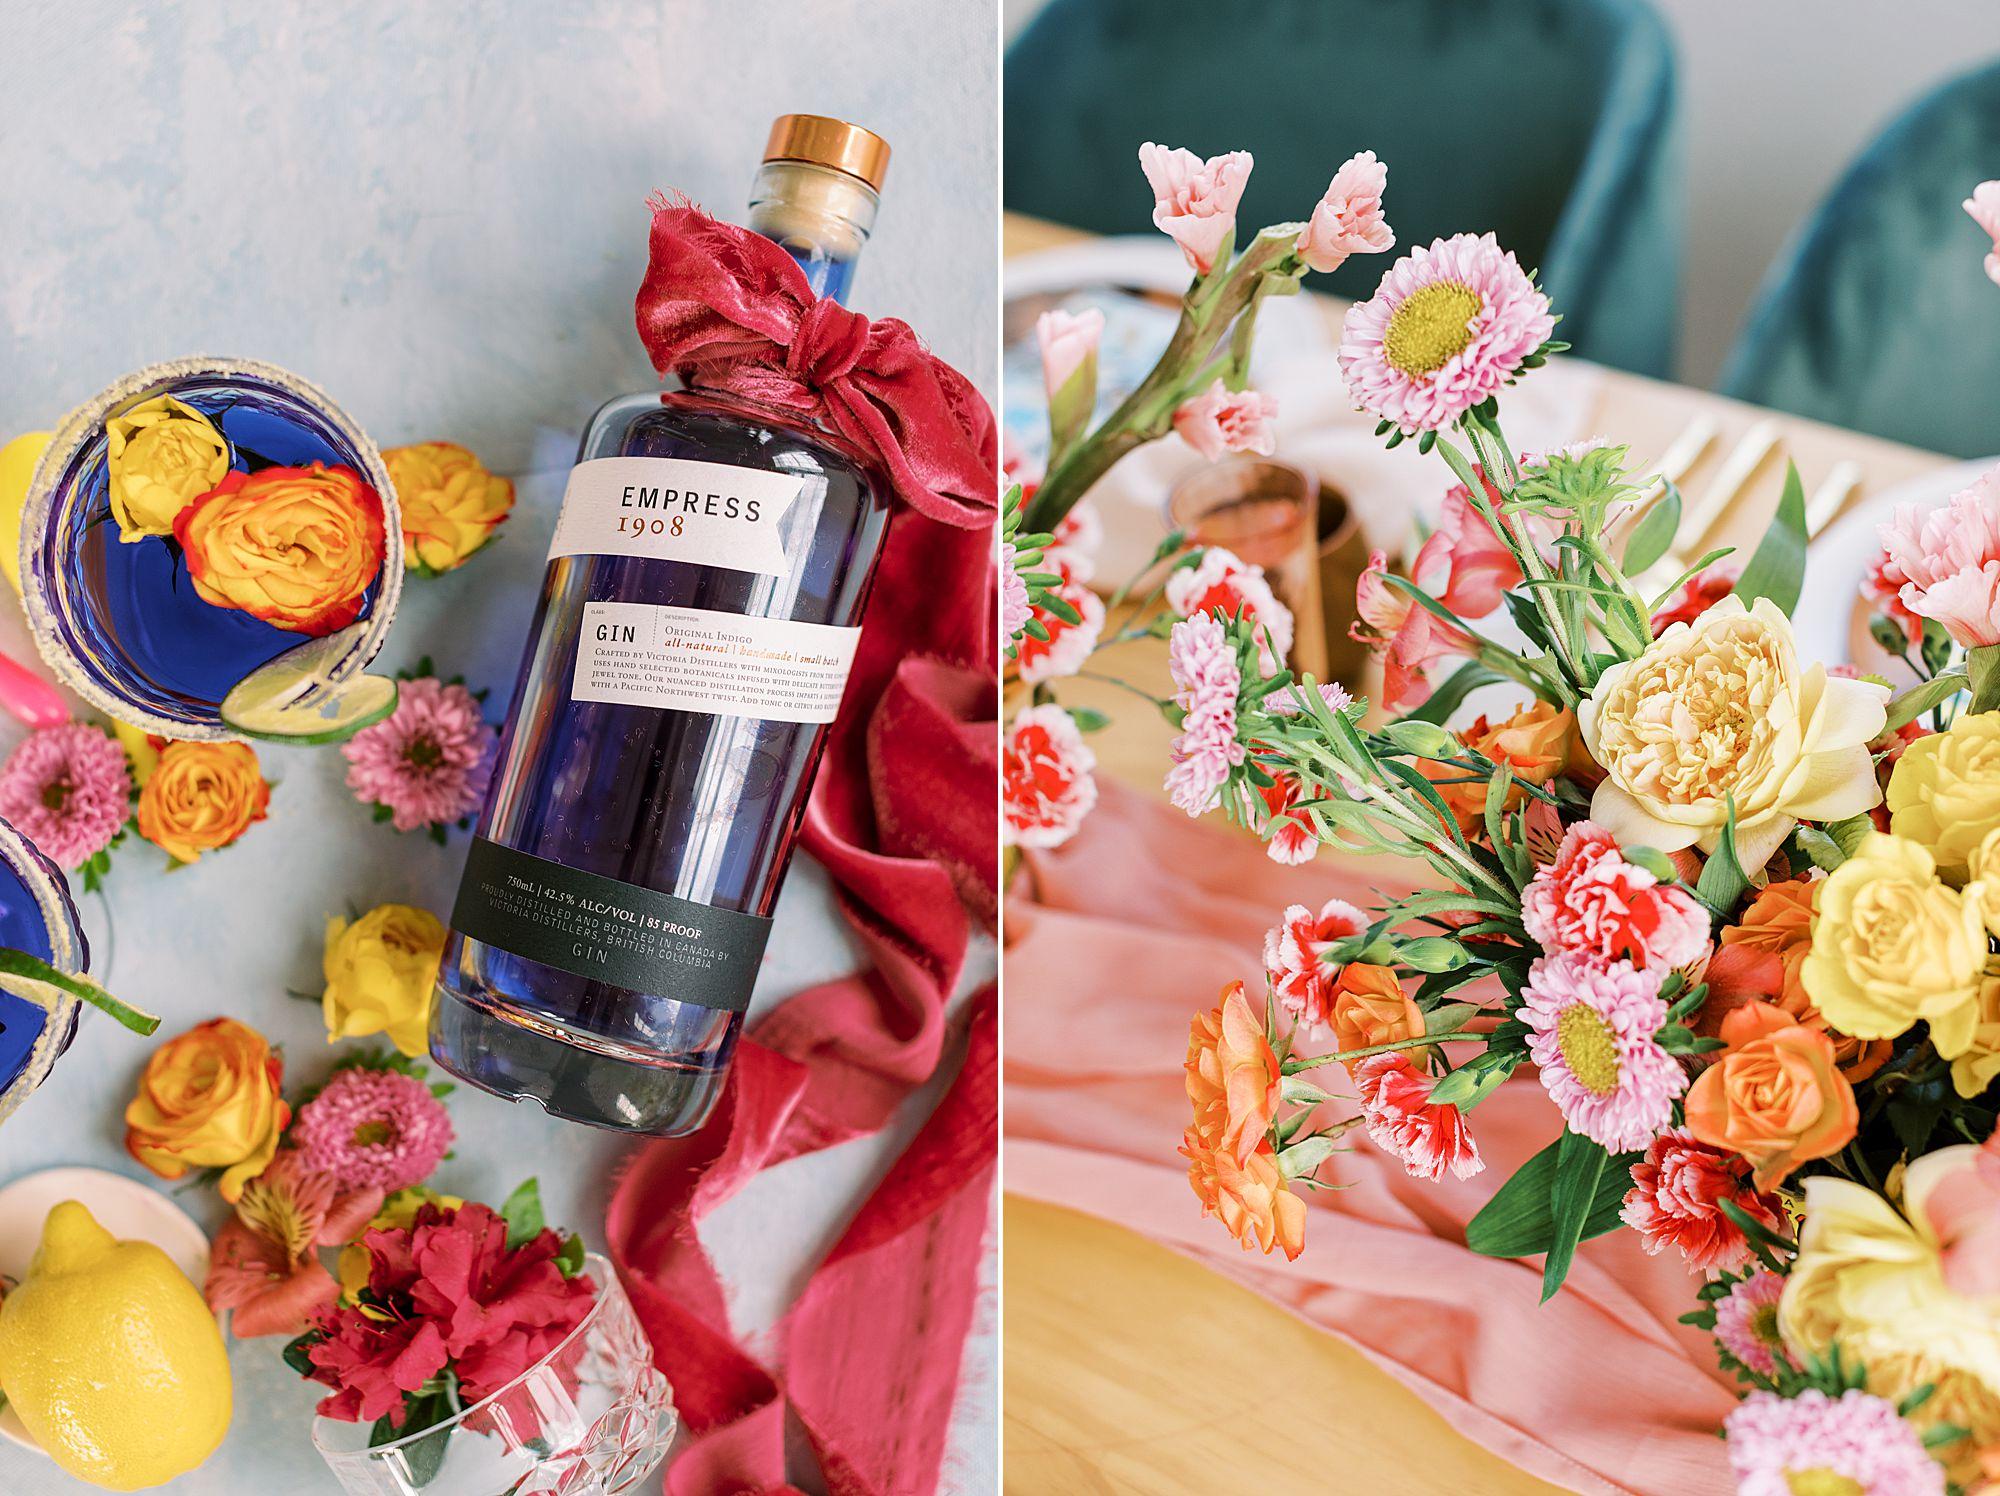 Cinco De Mayo Inspiration for Your FIesta - Party Crush Studio and Ashley Baumgartner_0043.jpg